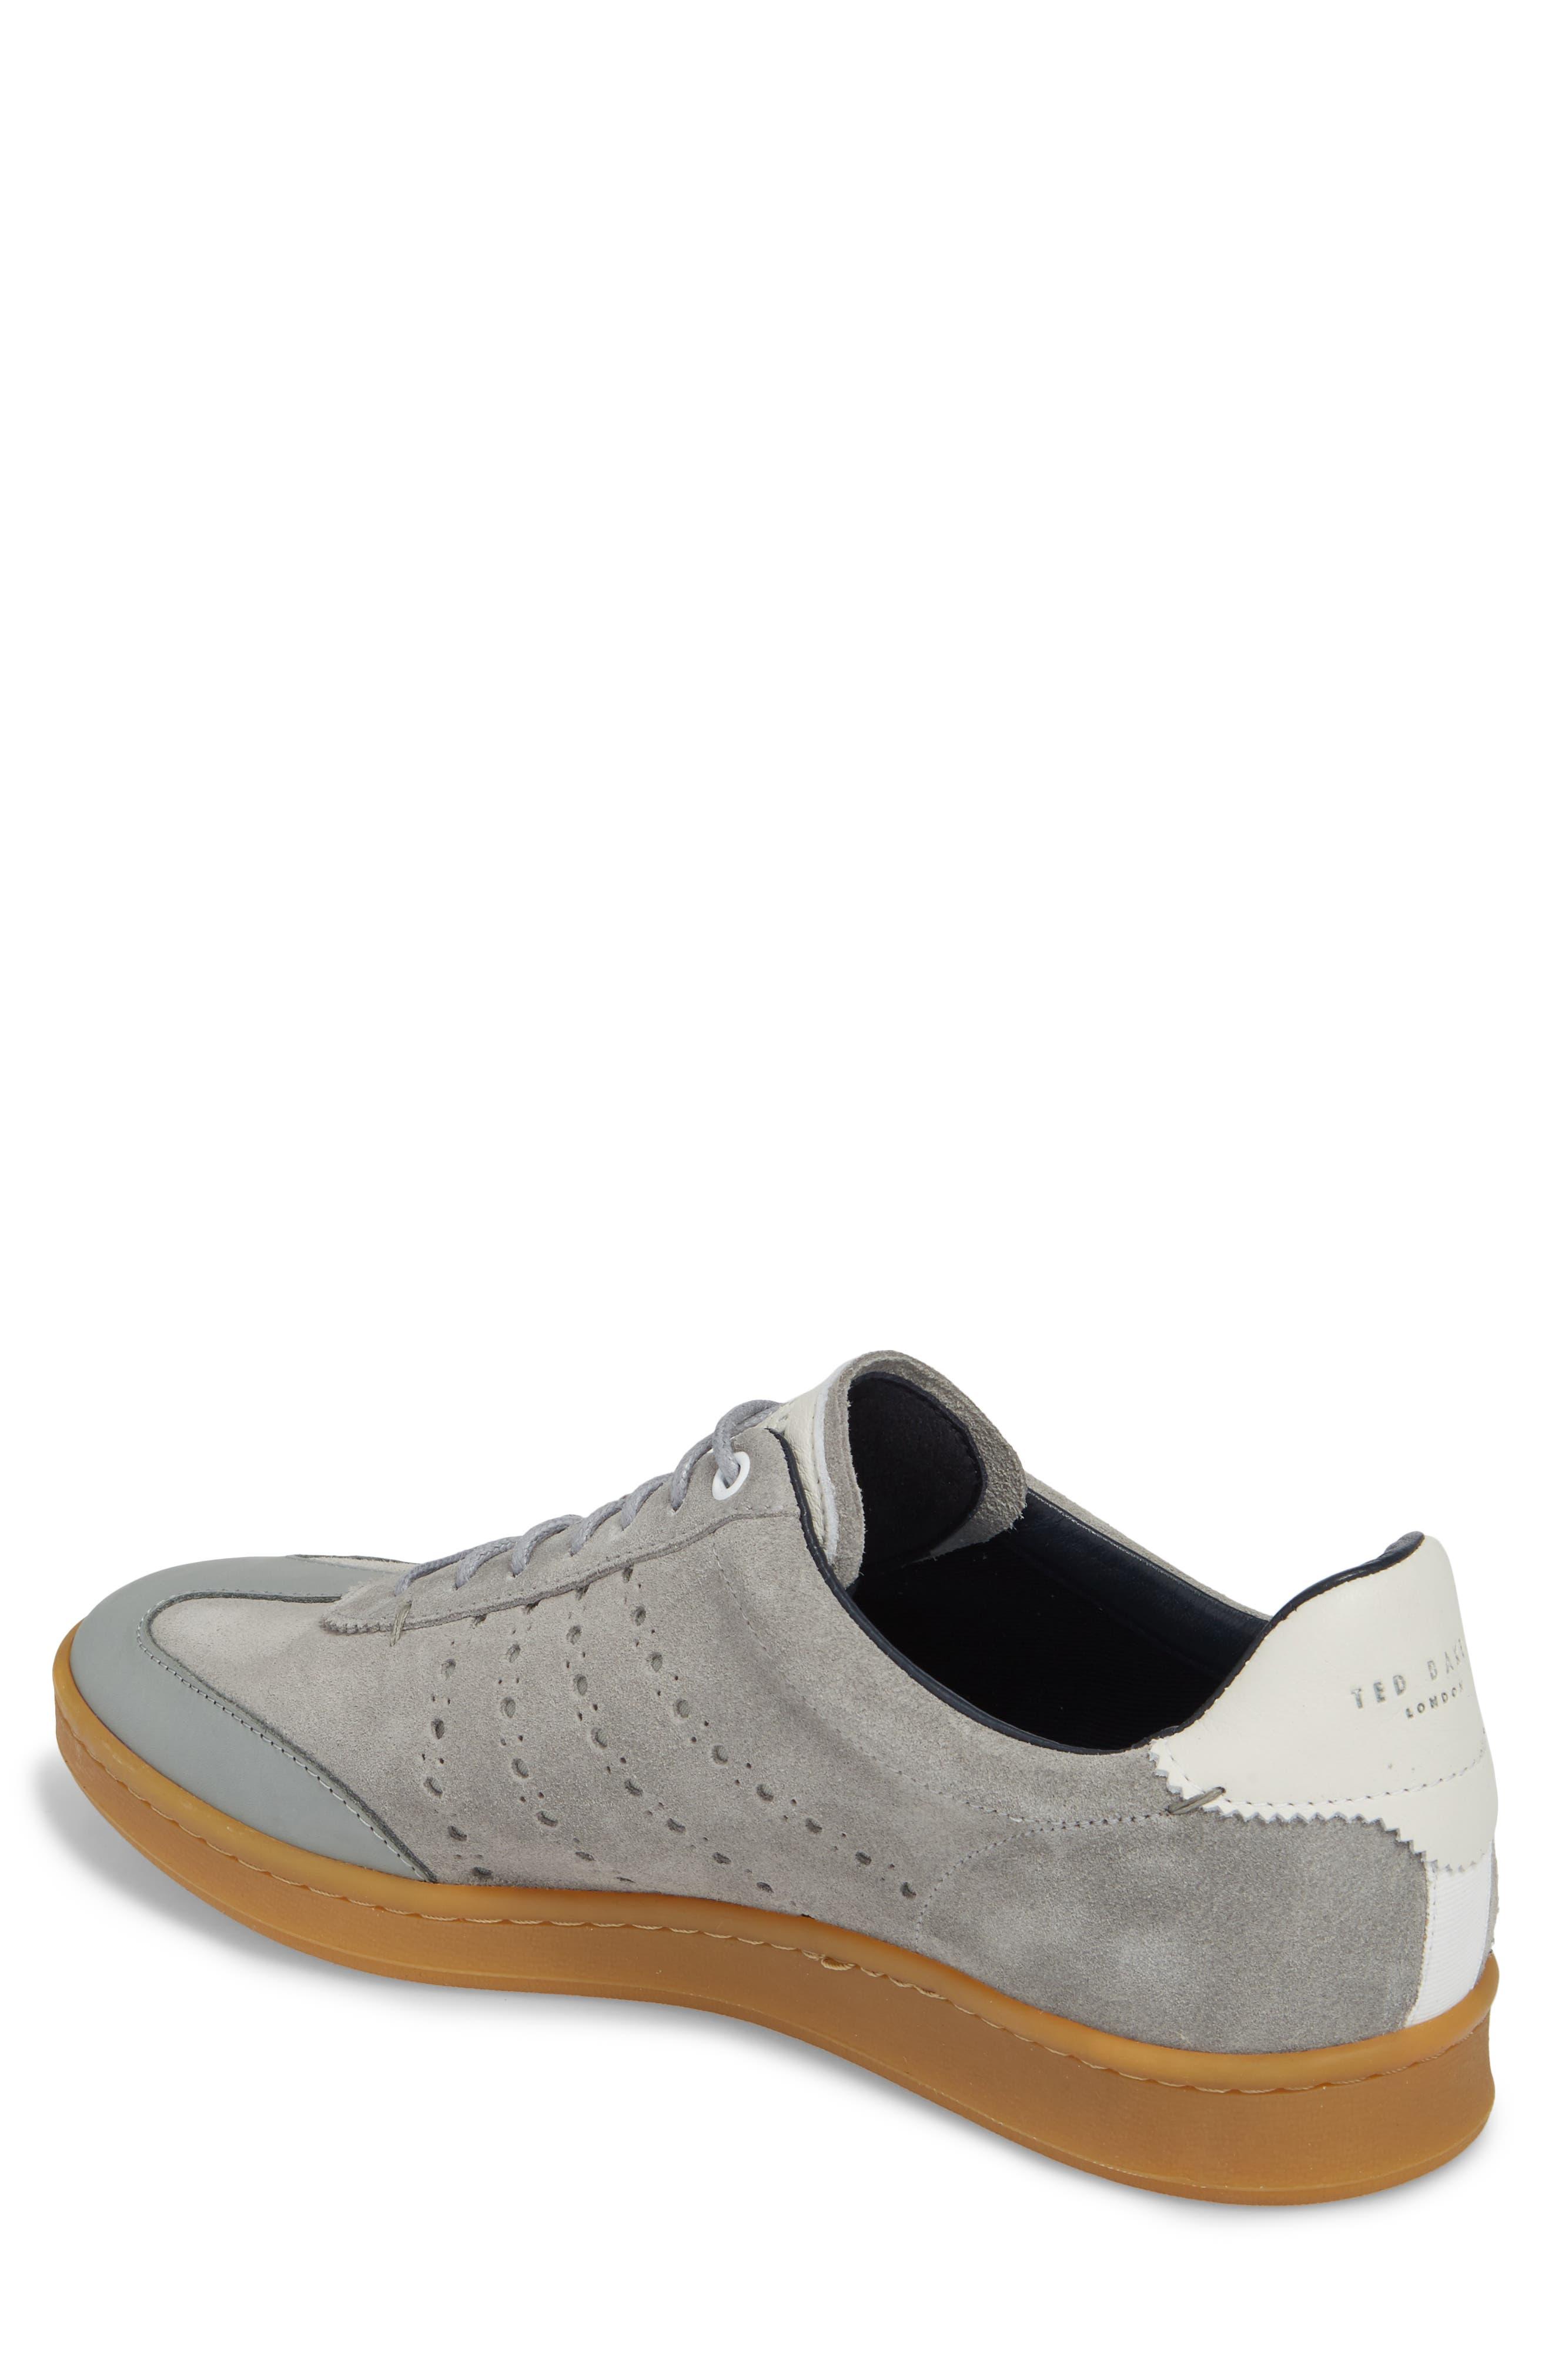 Orlees Low Top Sneaker,                             Alternate thumbnail 3, color,